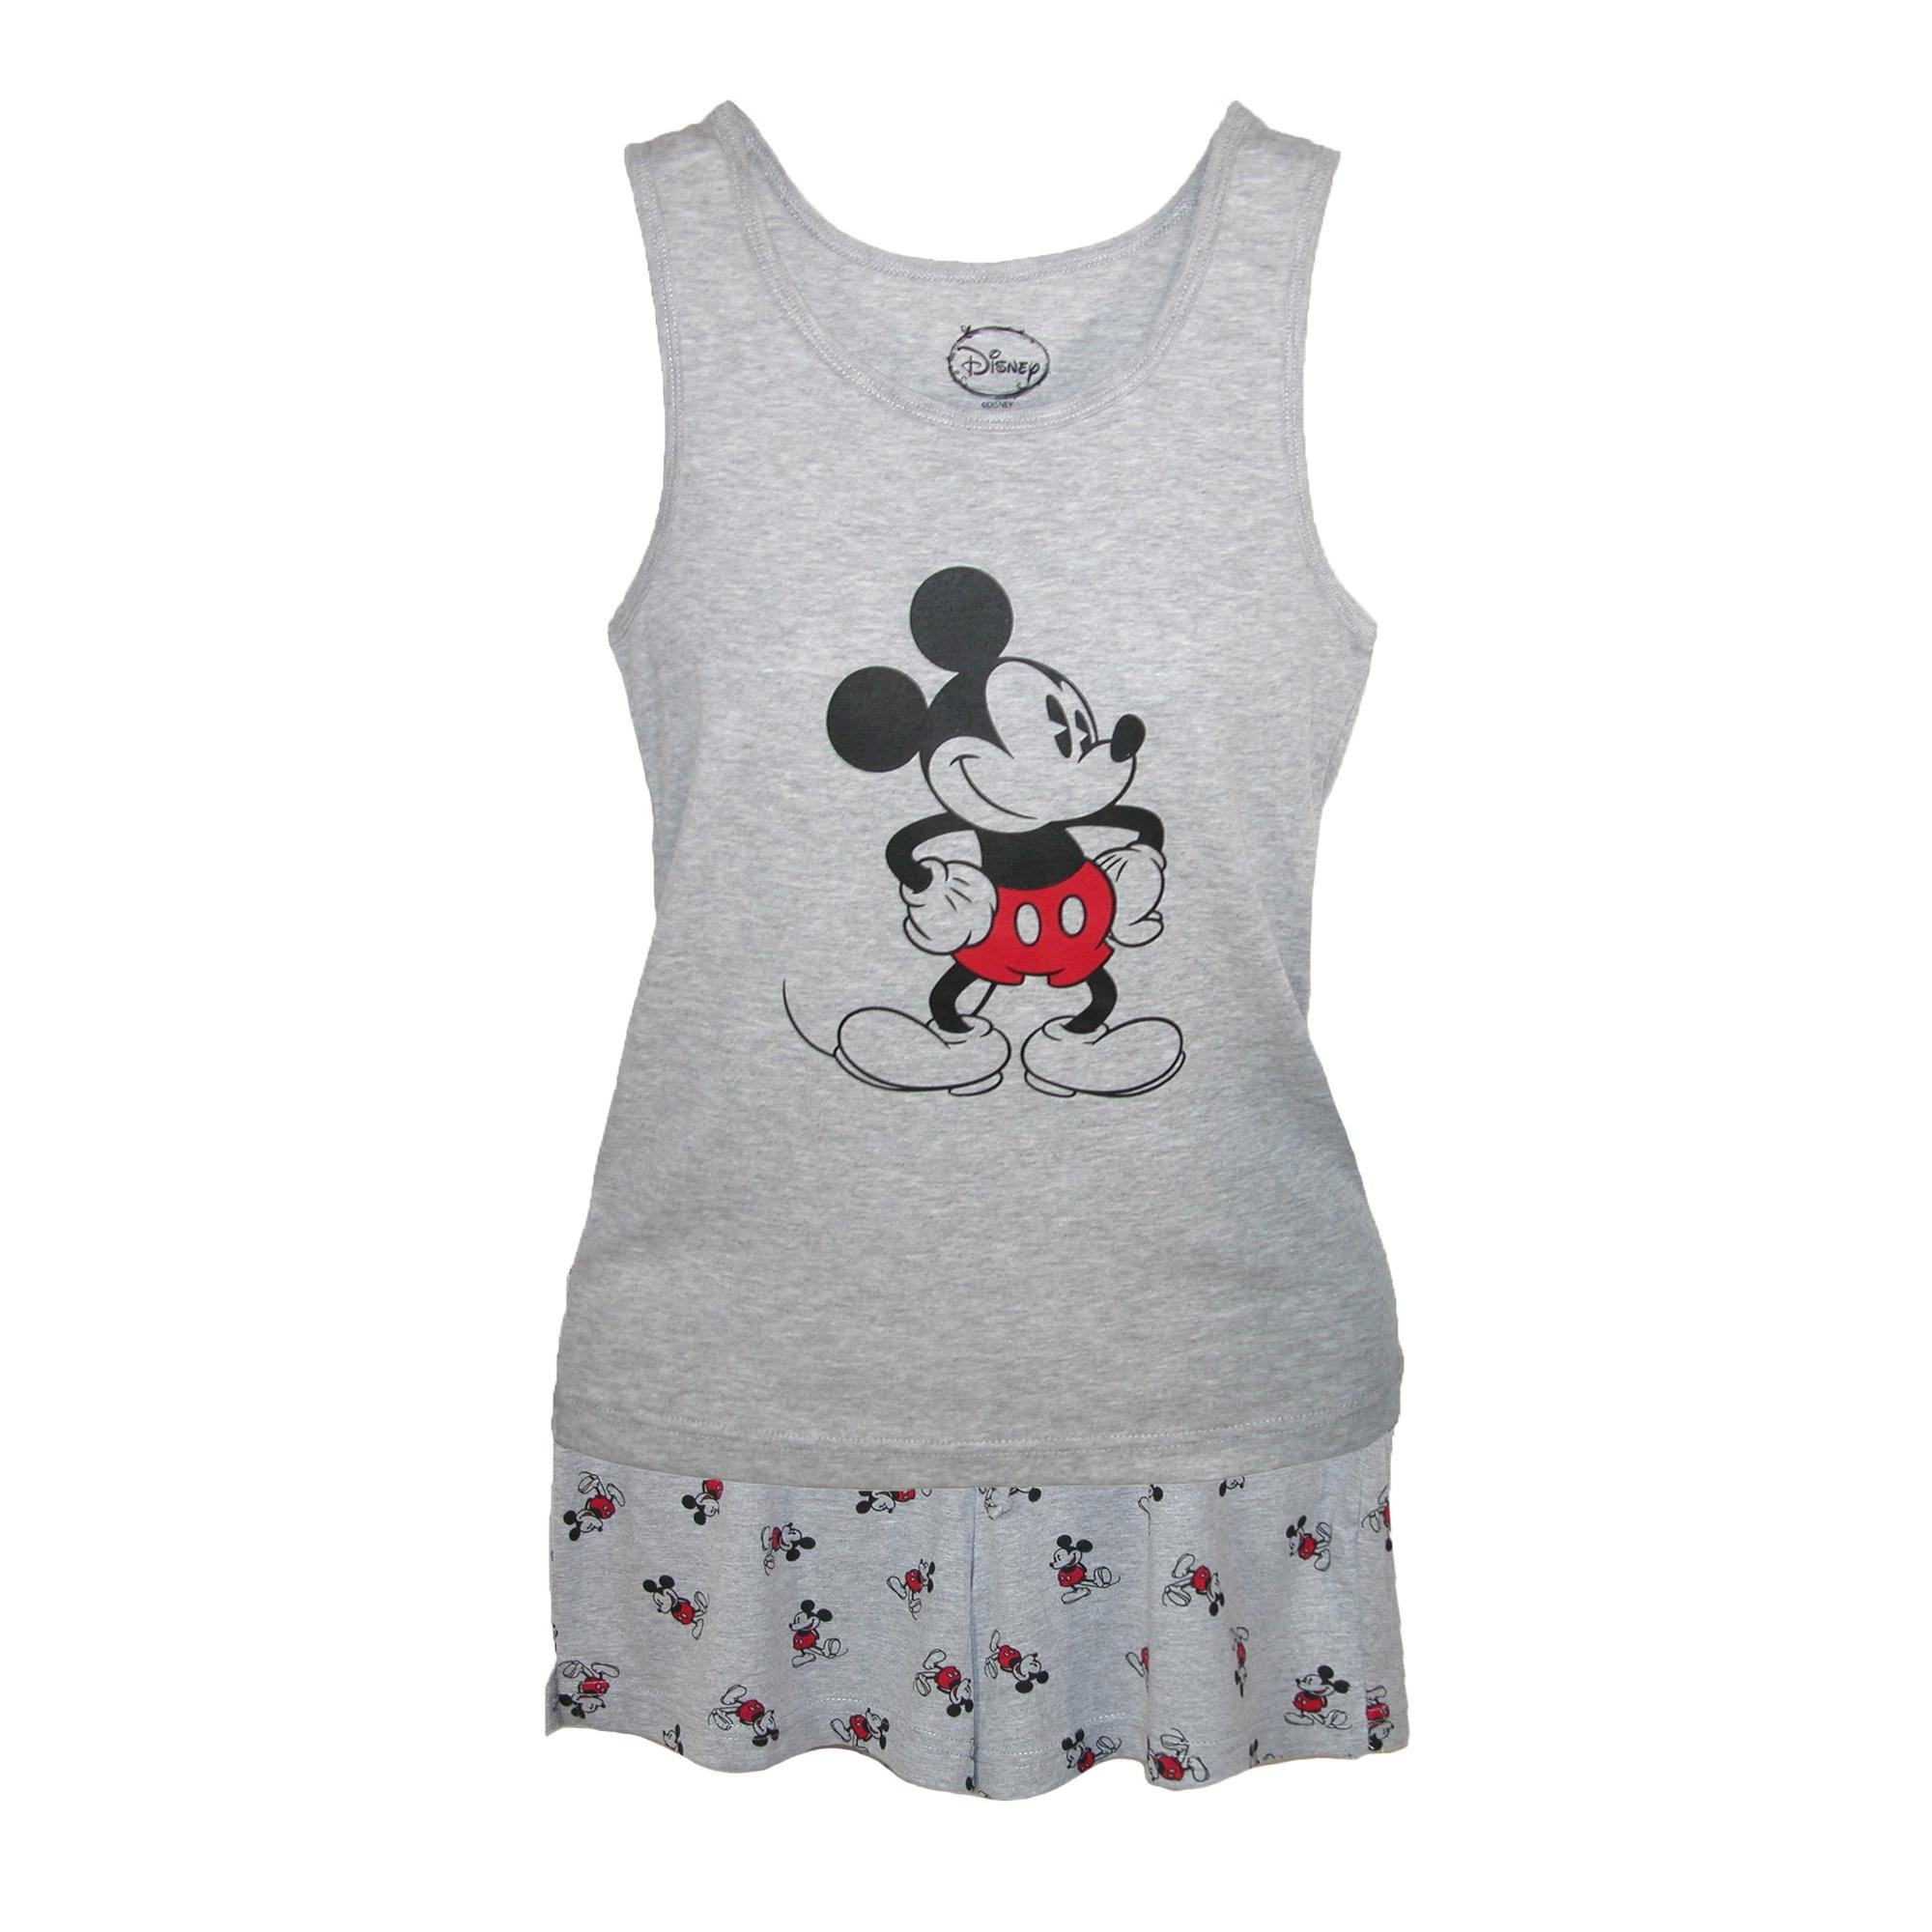 Disney Mickey Mouse Tank and Shorts Pajama Set, Large, Grey